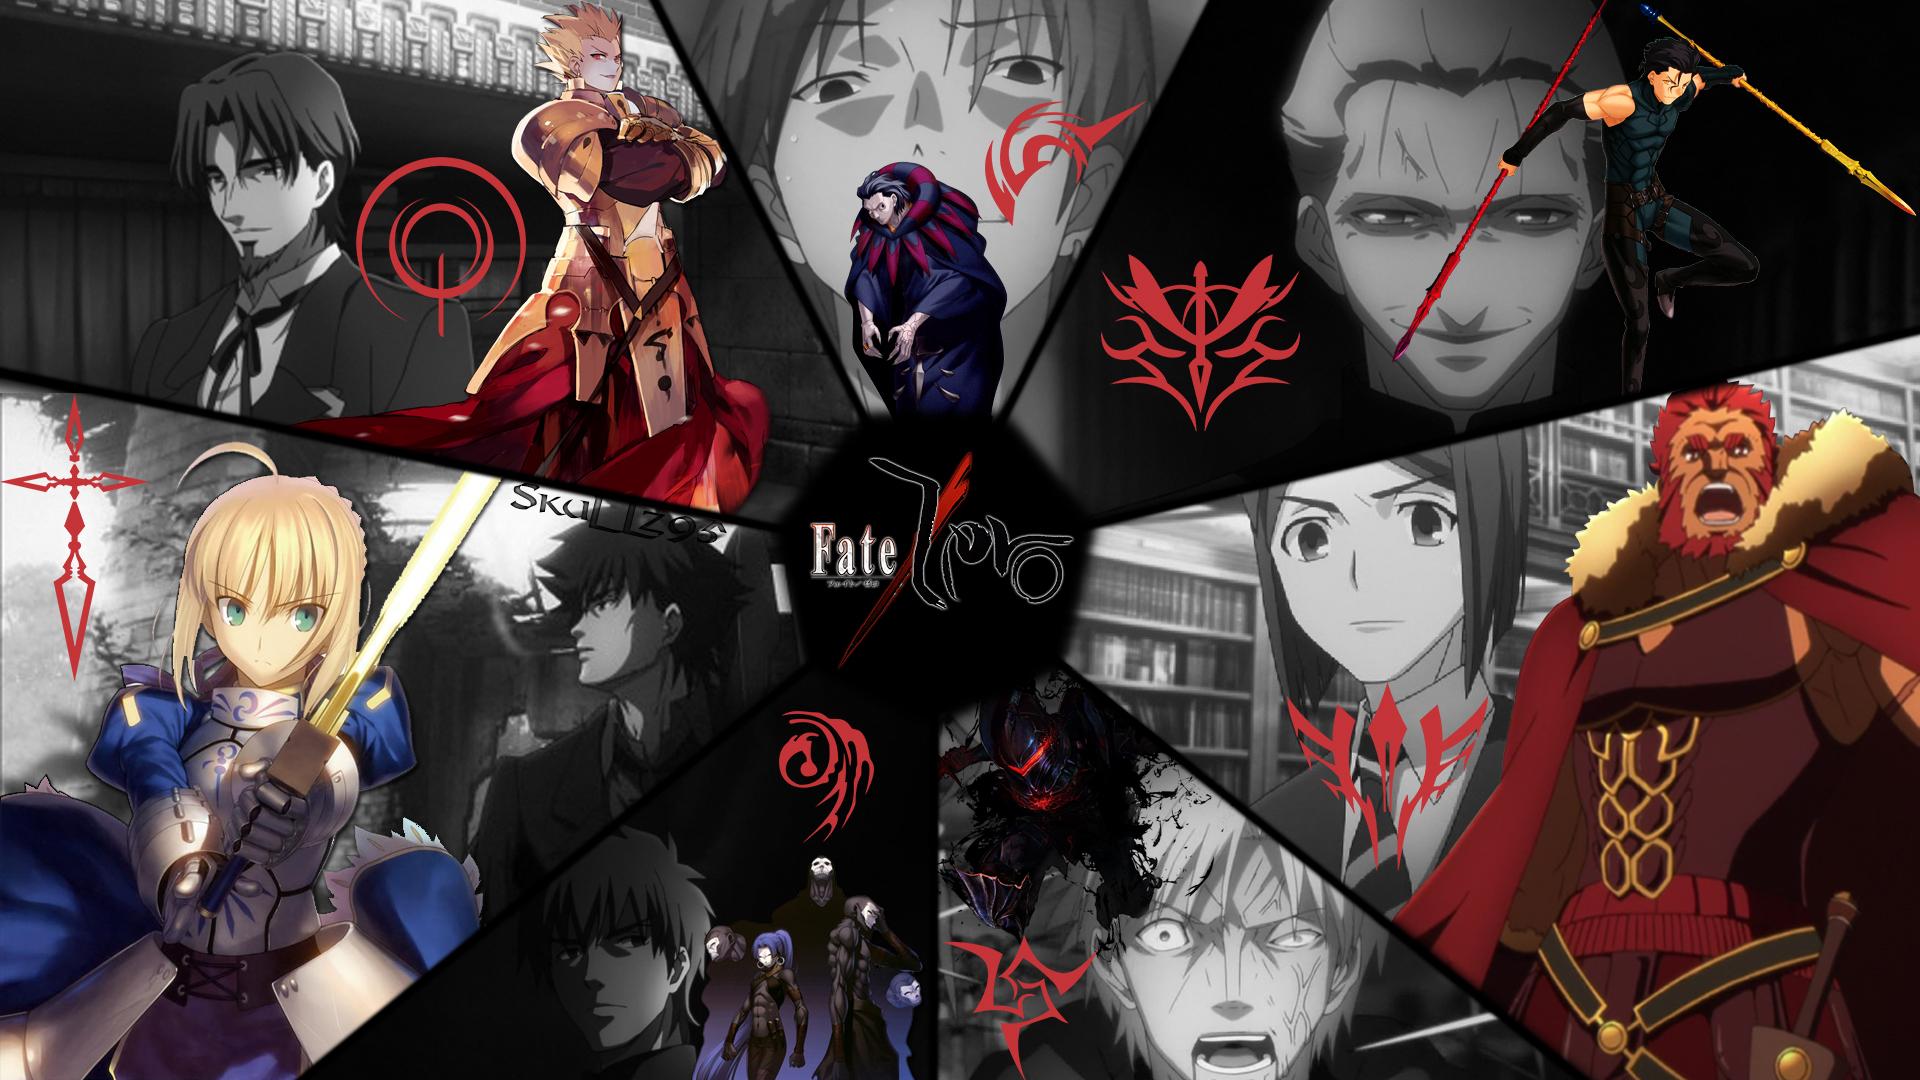 Fate Zero Masters And Servants Wallpaper By Skullz95 On Deviantart